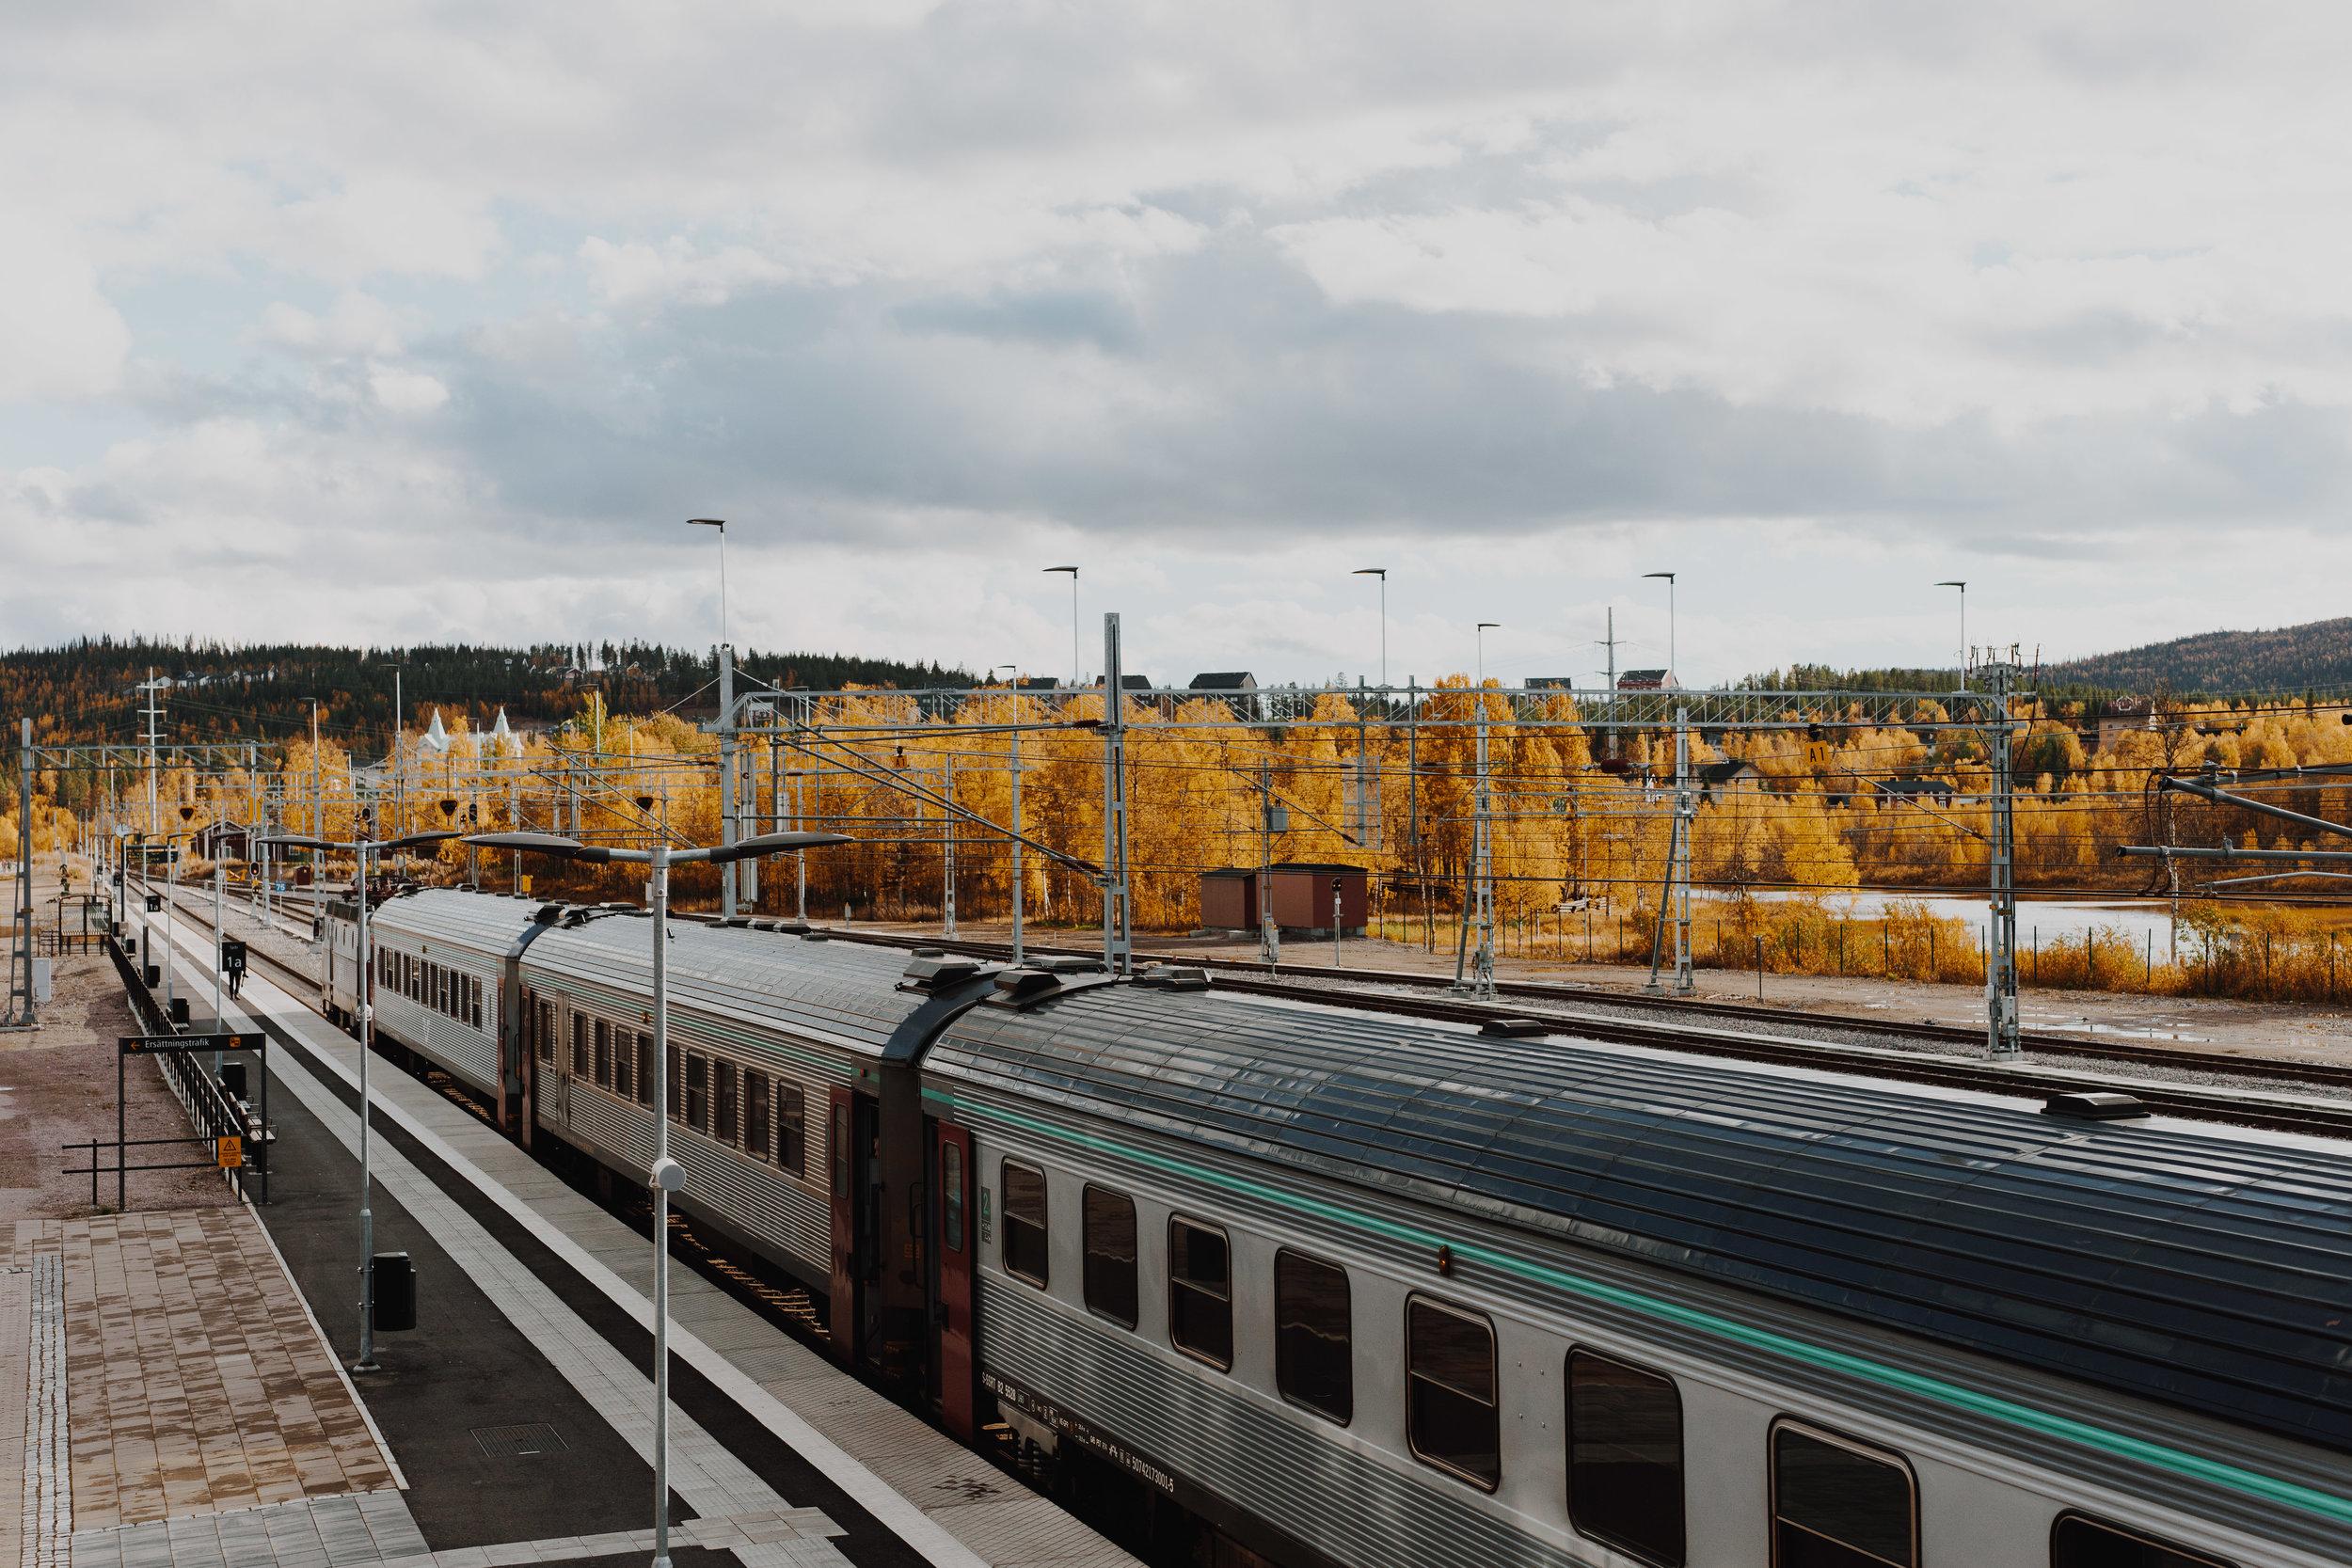 ASROSENVINGE_Interrail_Norden_2018_Togstation_Arctic Circle_Gällivare_Lapland_Sverige_LowRes-09825.jpg